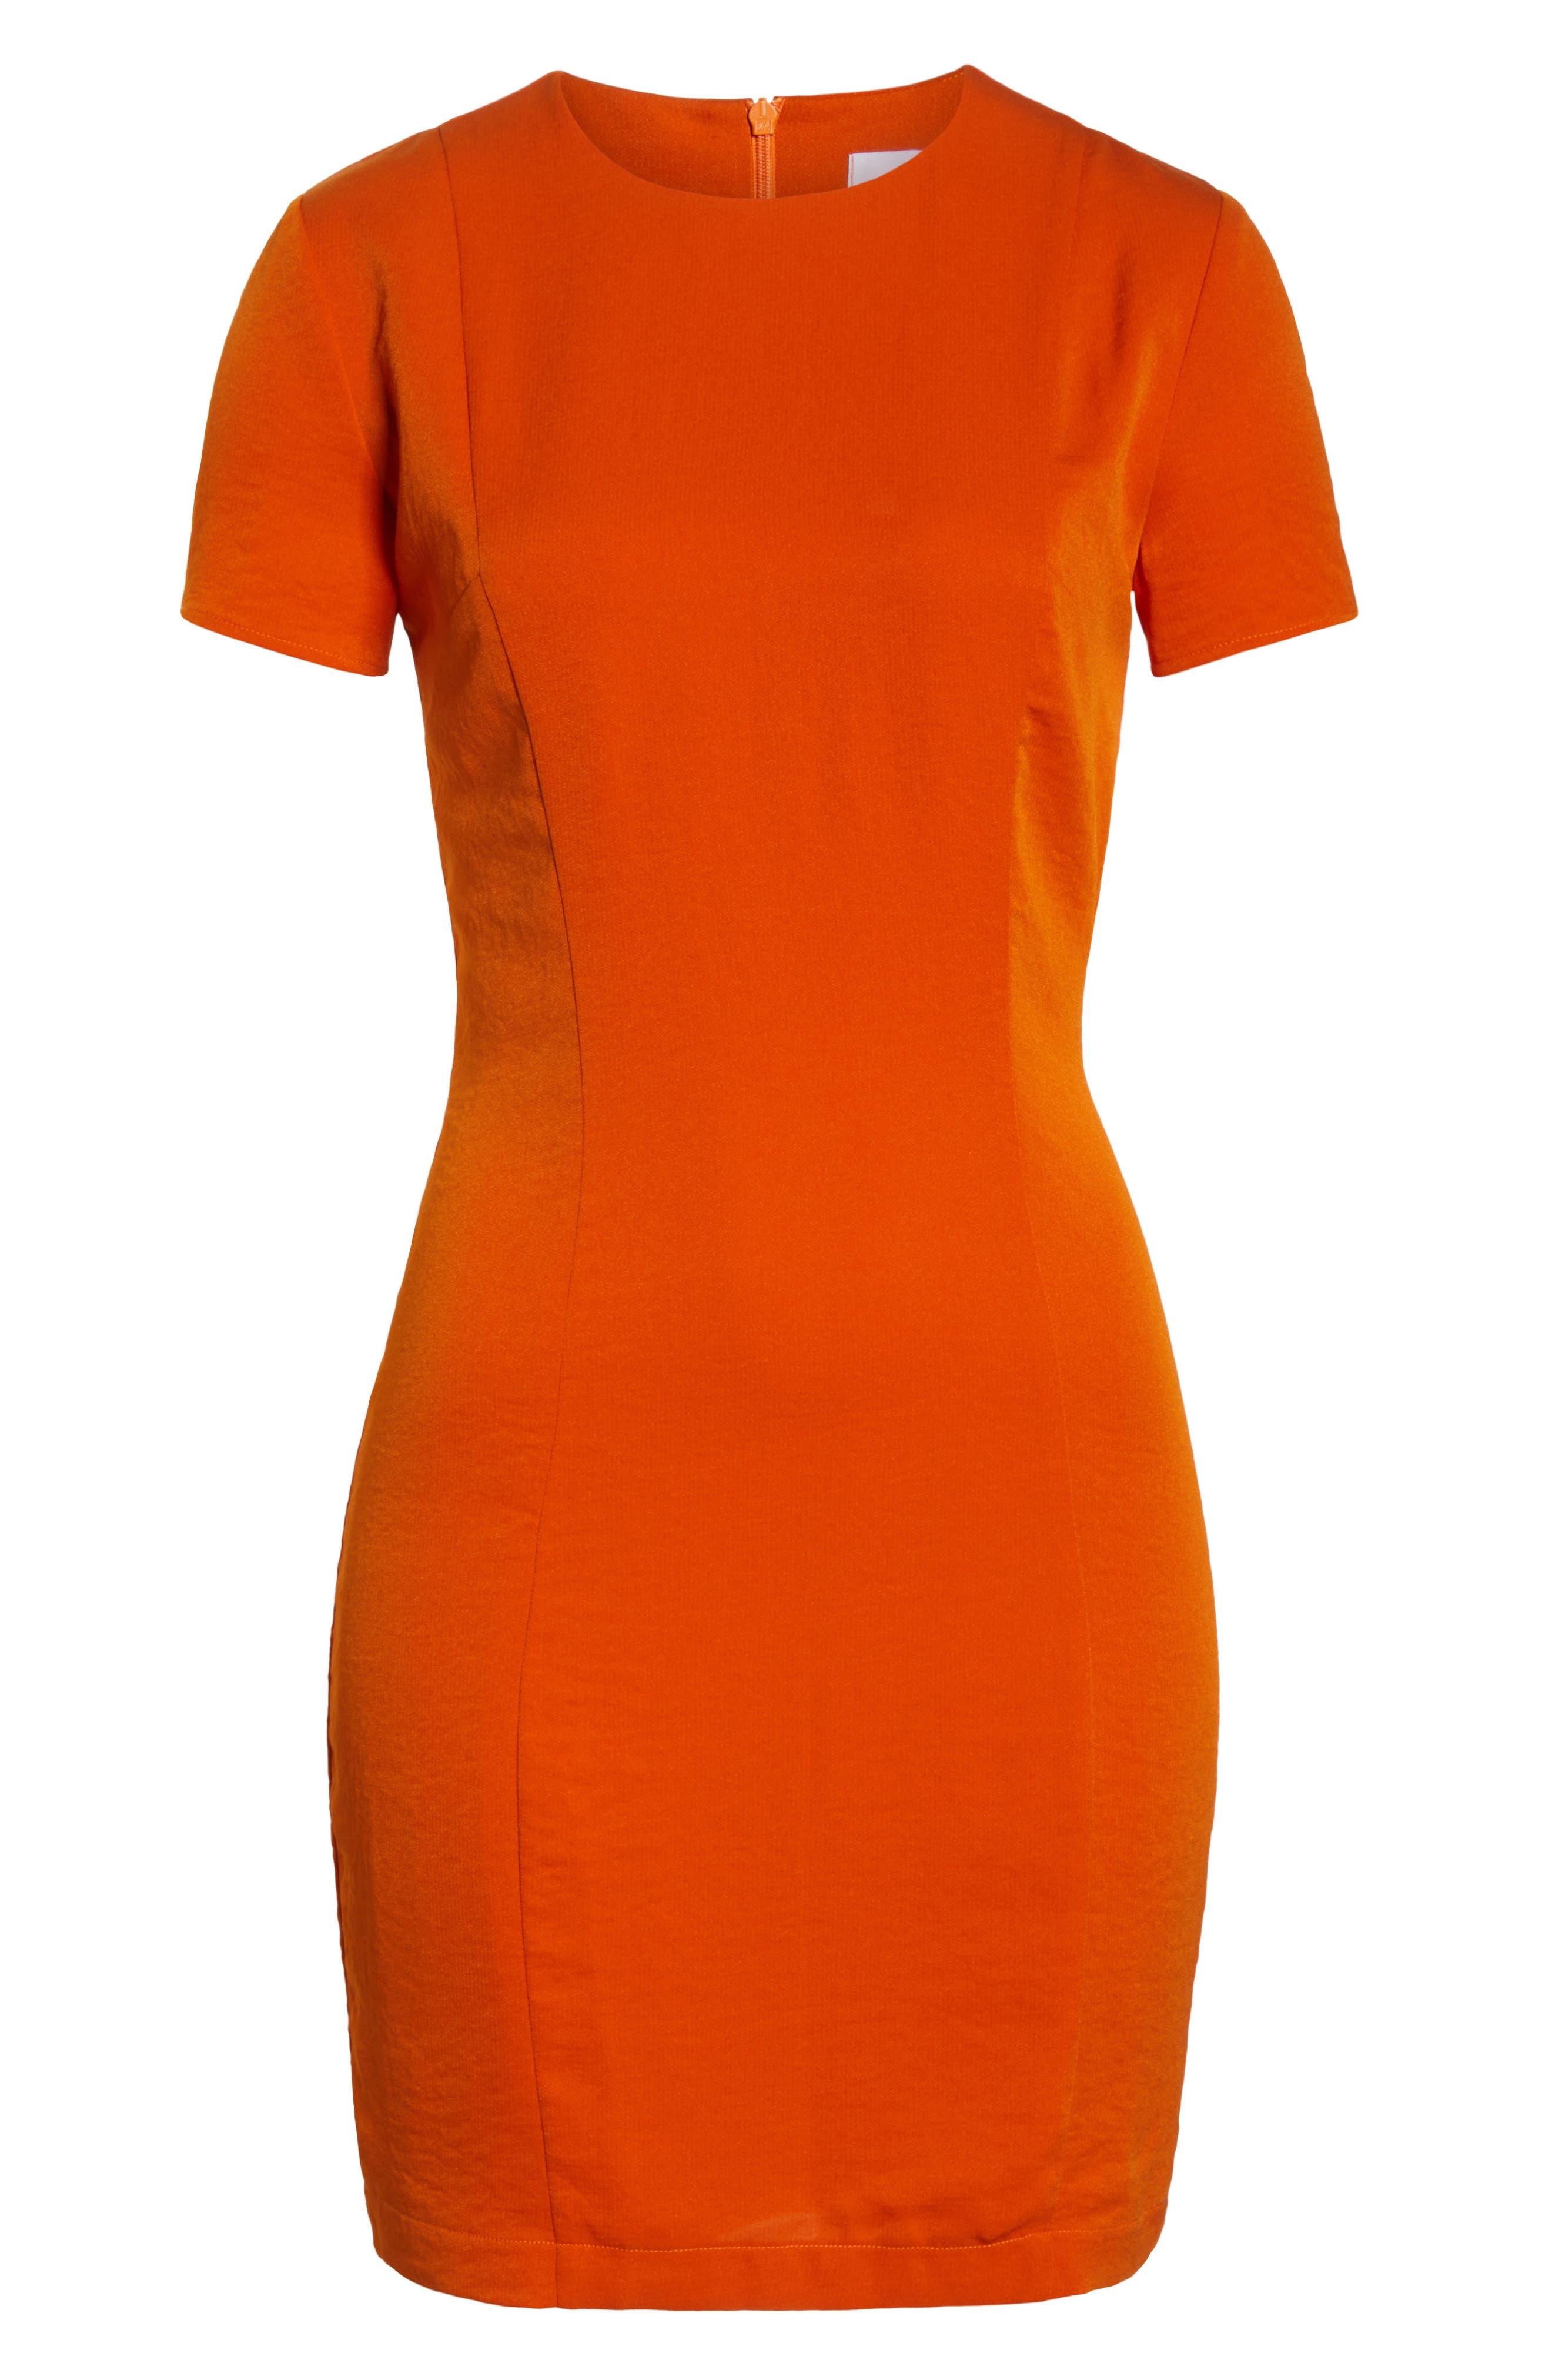 Sofia Short Sleeve Sheath Dress,                             Alternate thumbnail 7, color,                             ORANGE